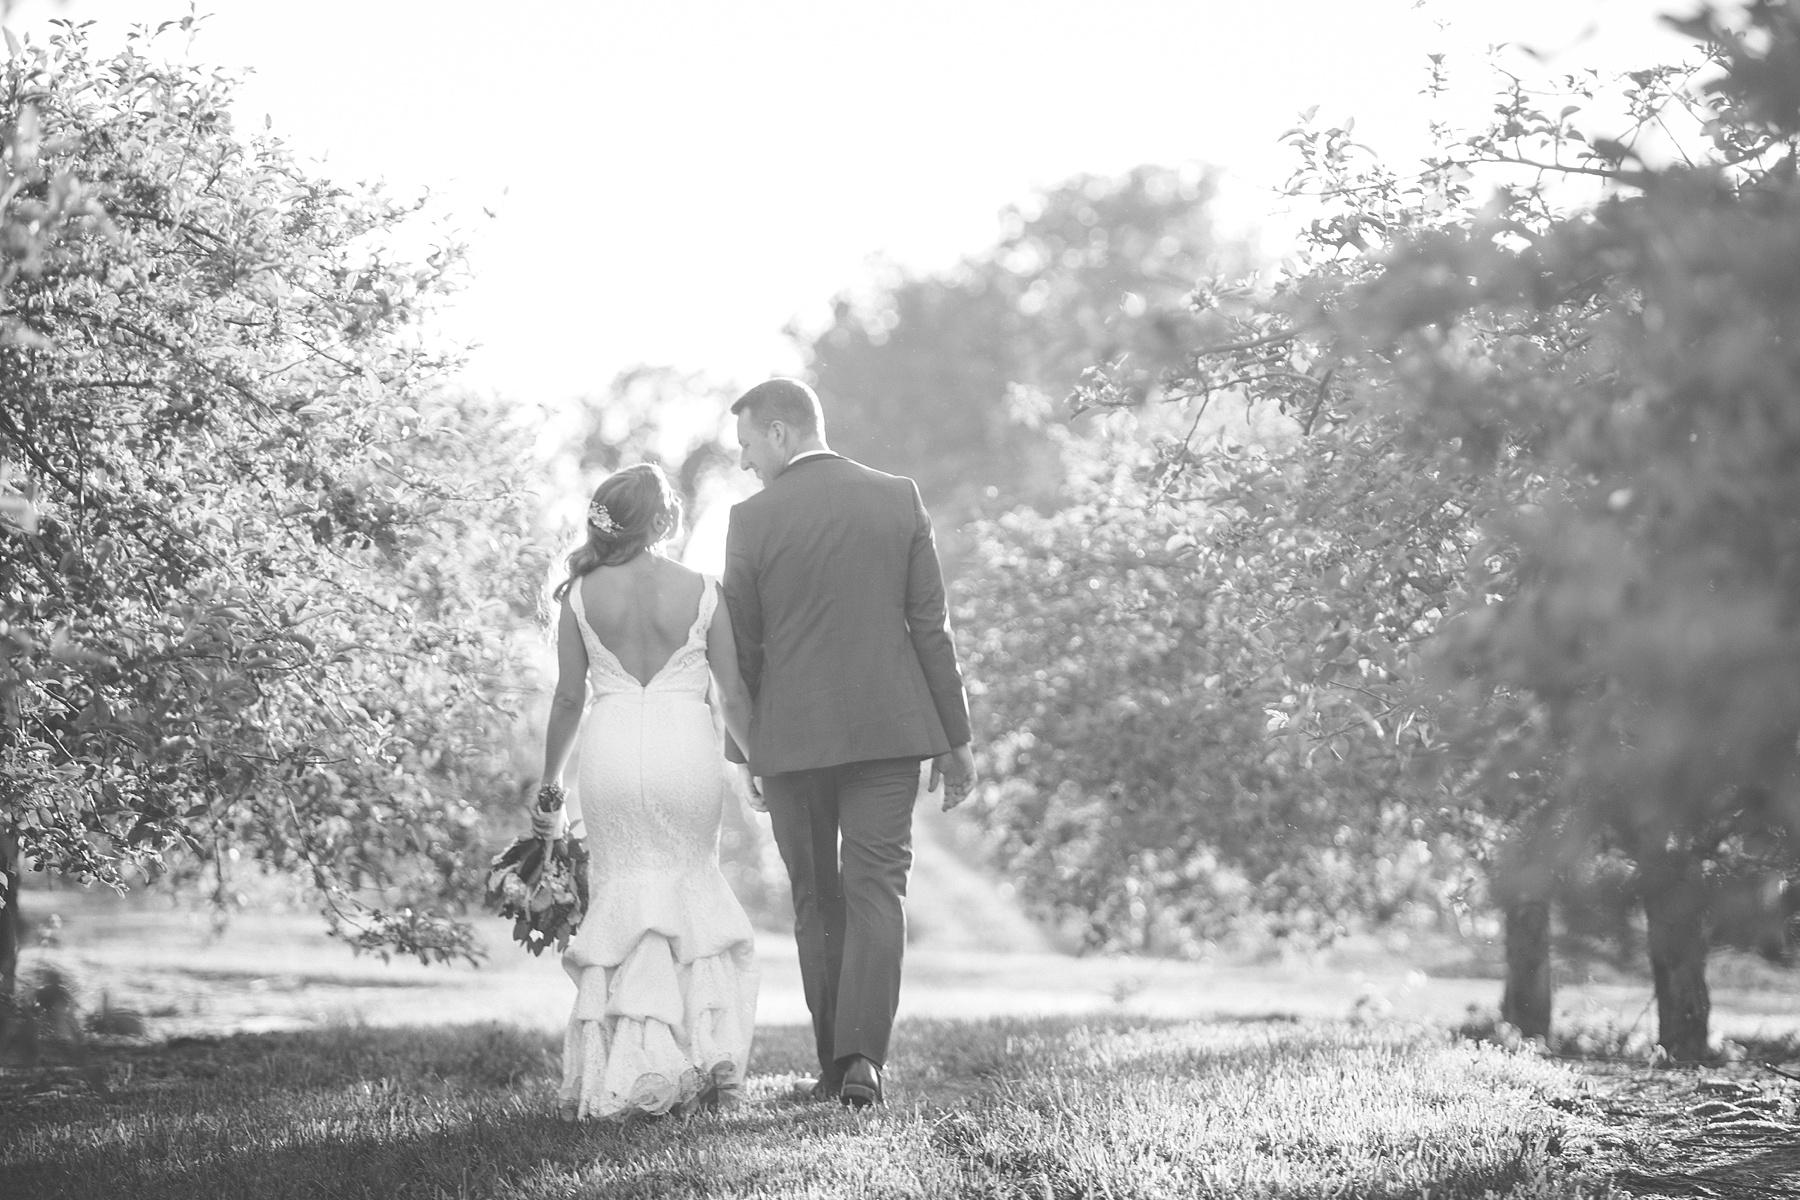 Brandon_Shafer_Photography_Kara_Doug_12_corners_Wedding_Benton_Harbor_0080.jpg